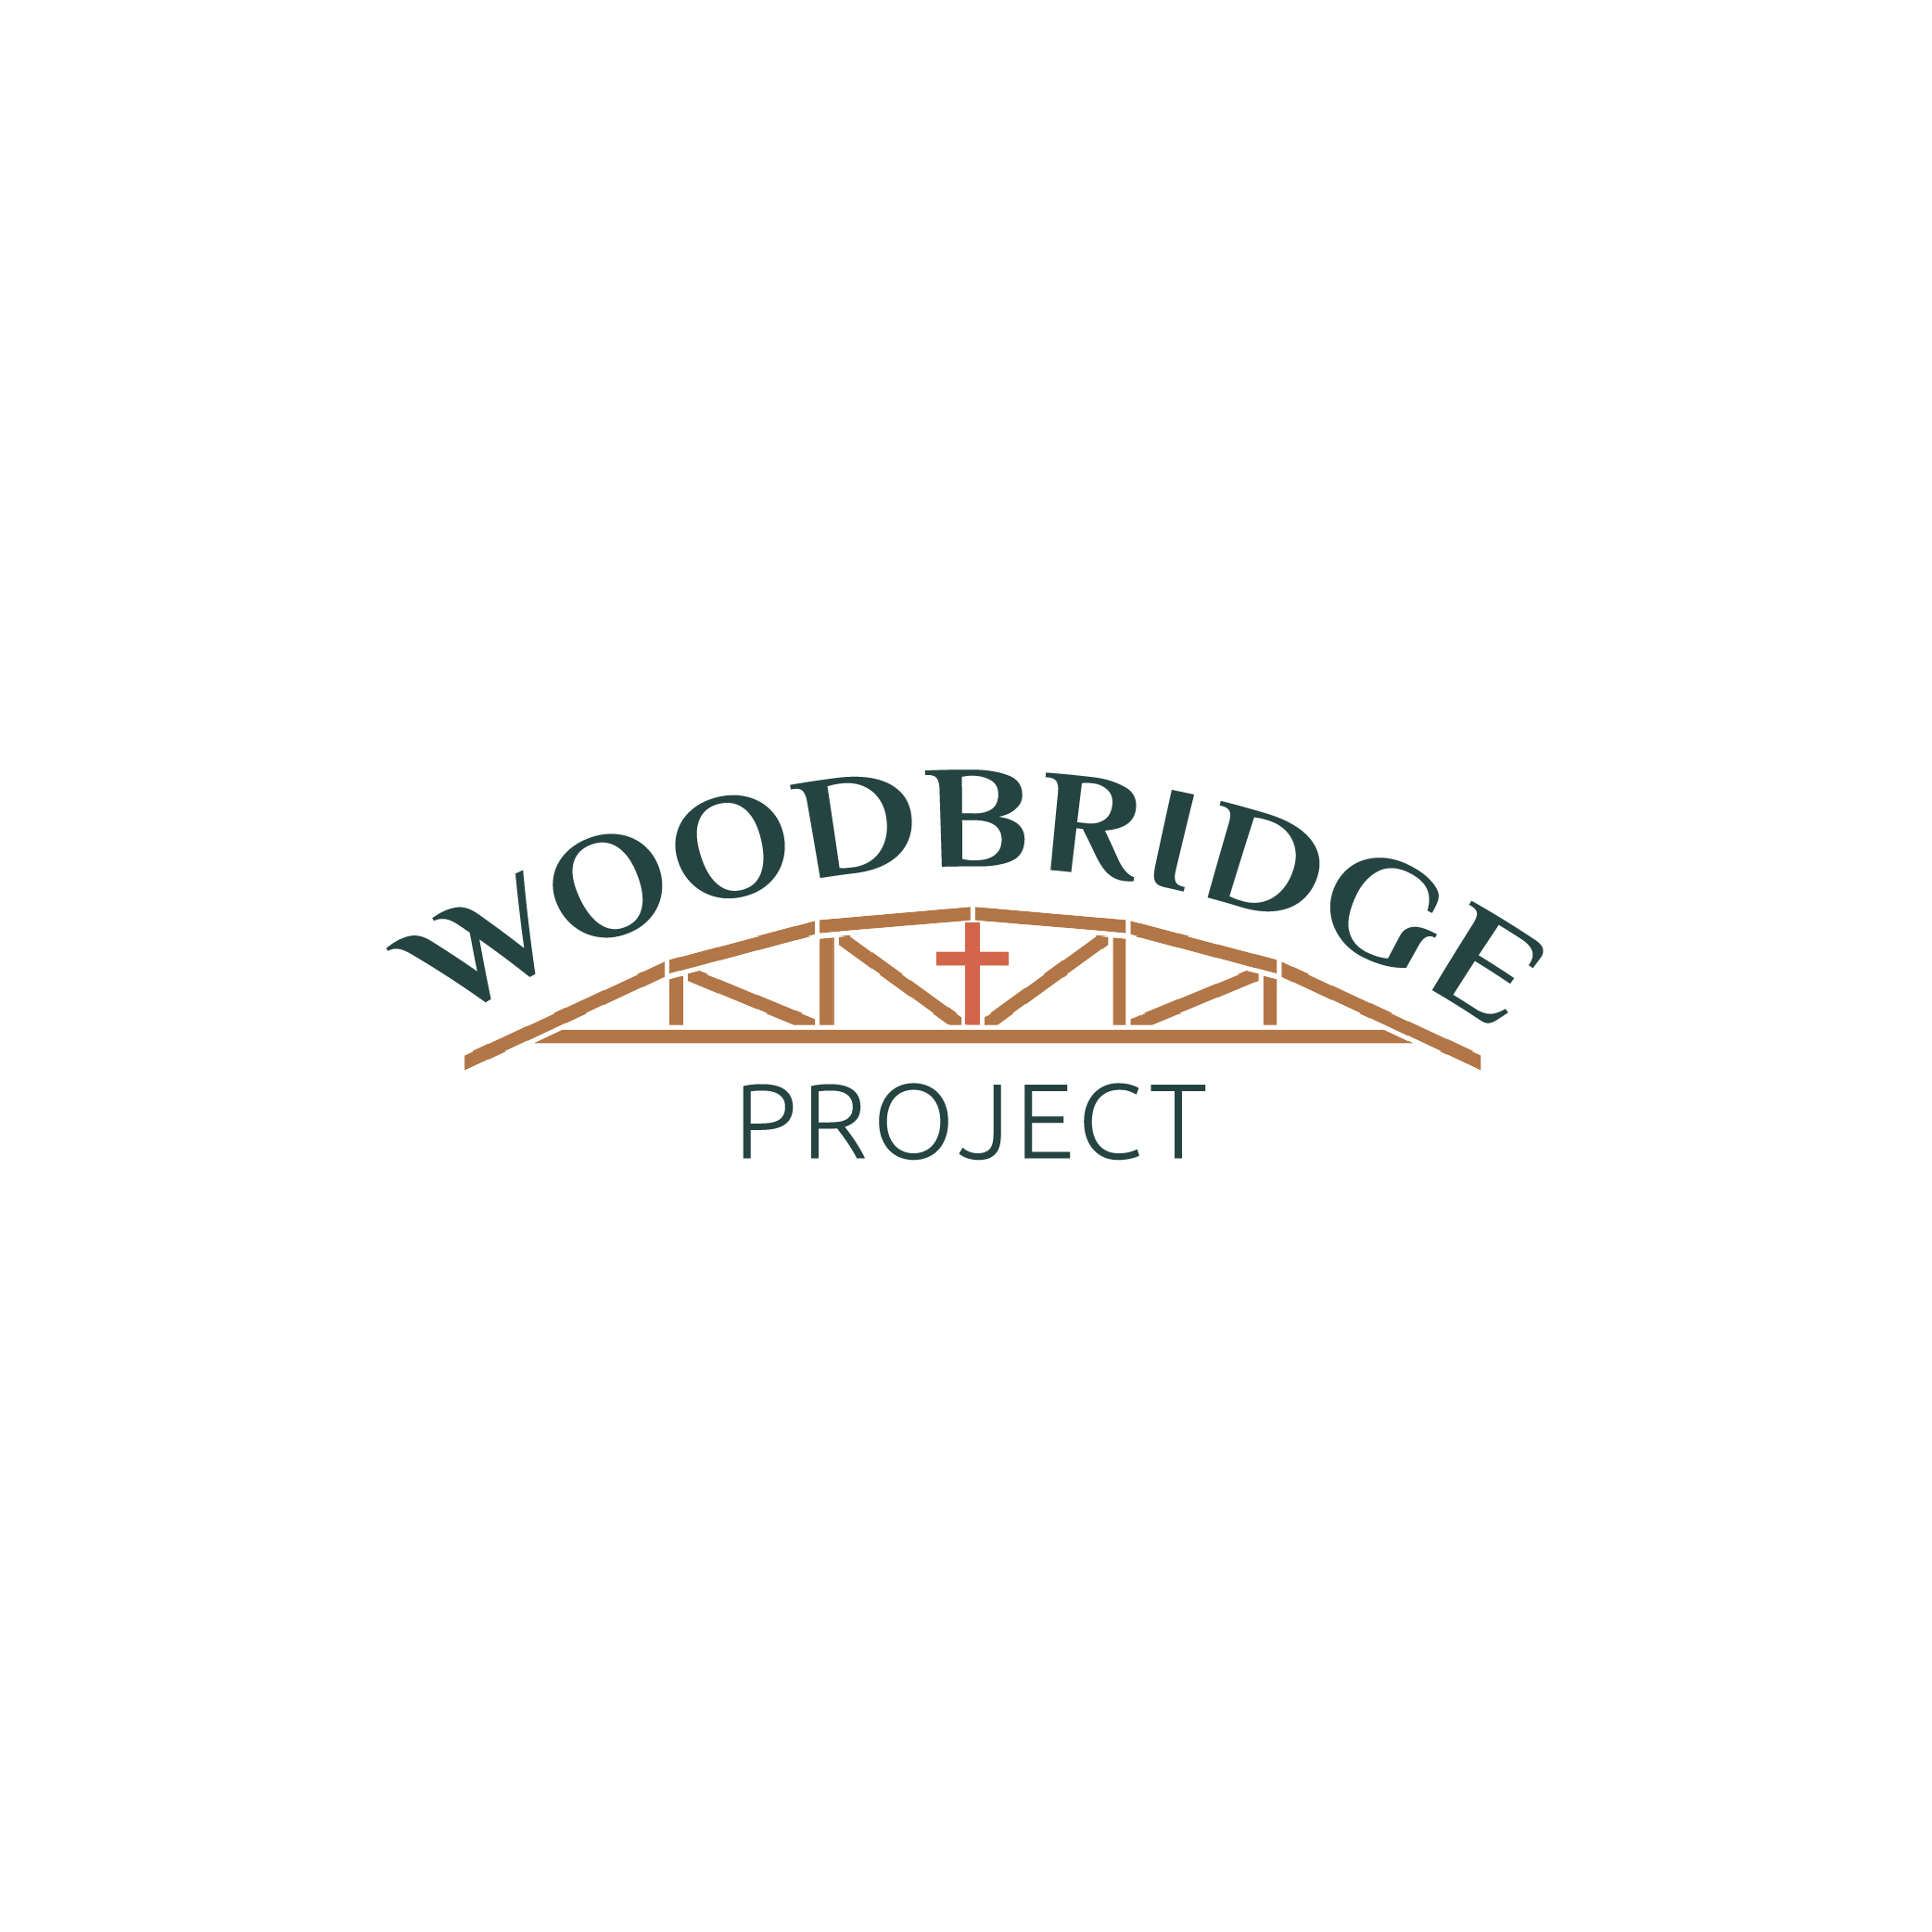 Woodbridge Box.jpg